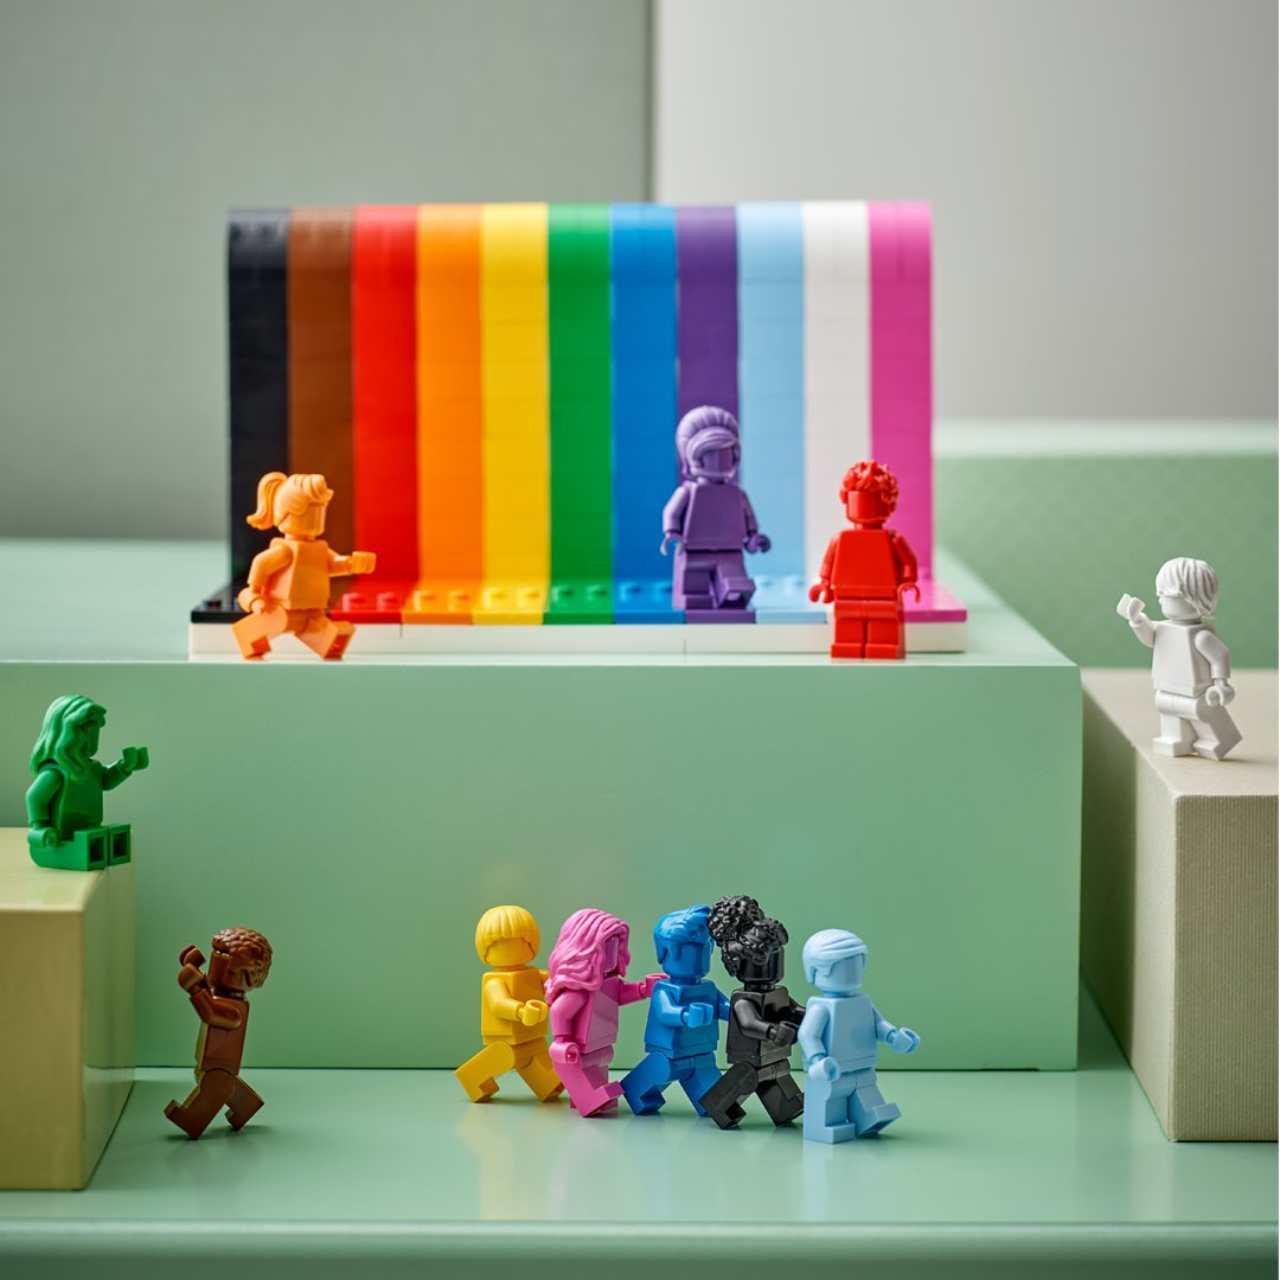 Los bloques arcoíris